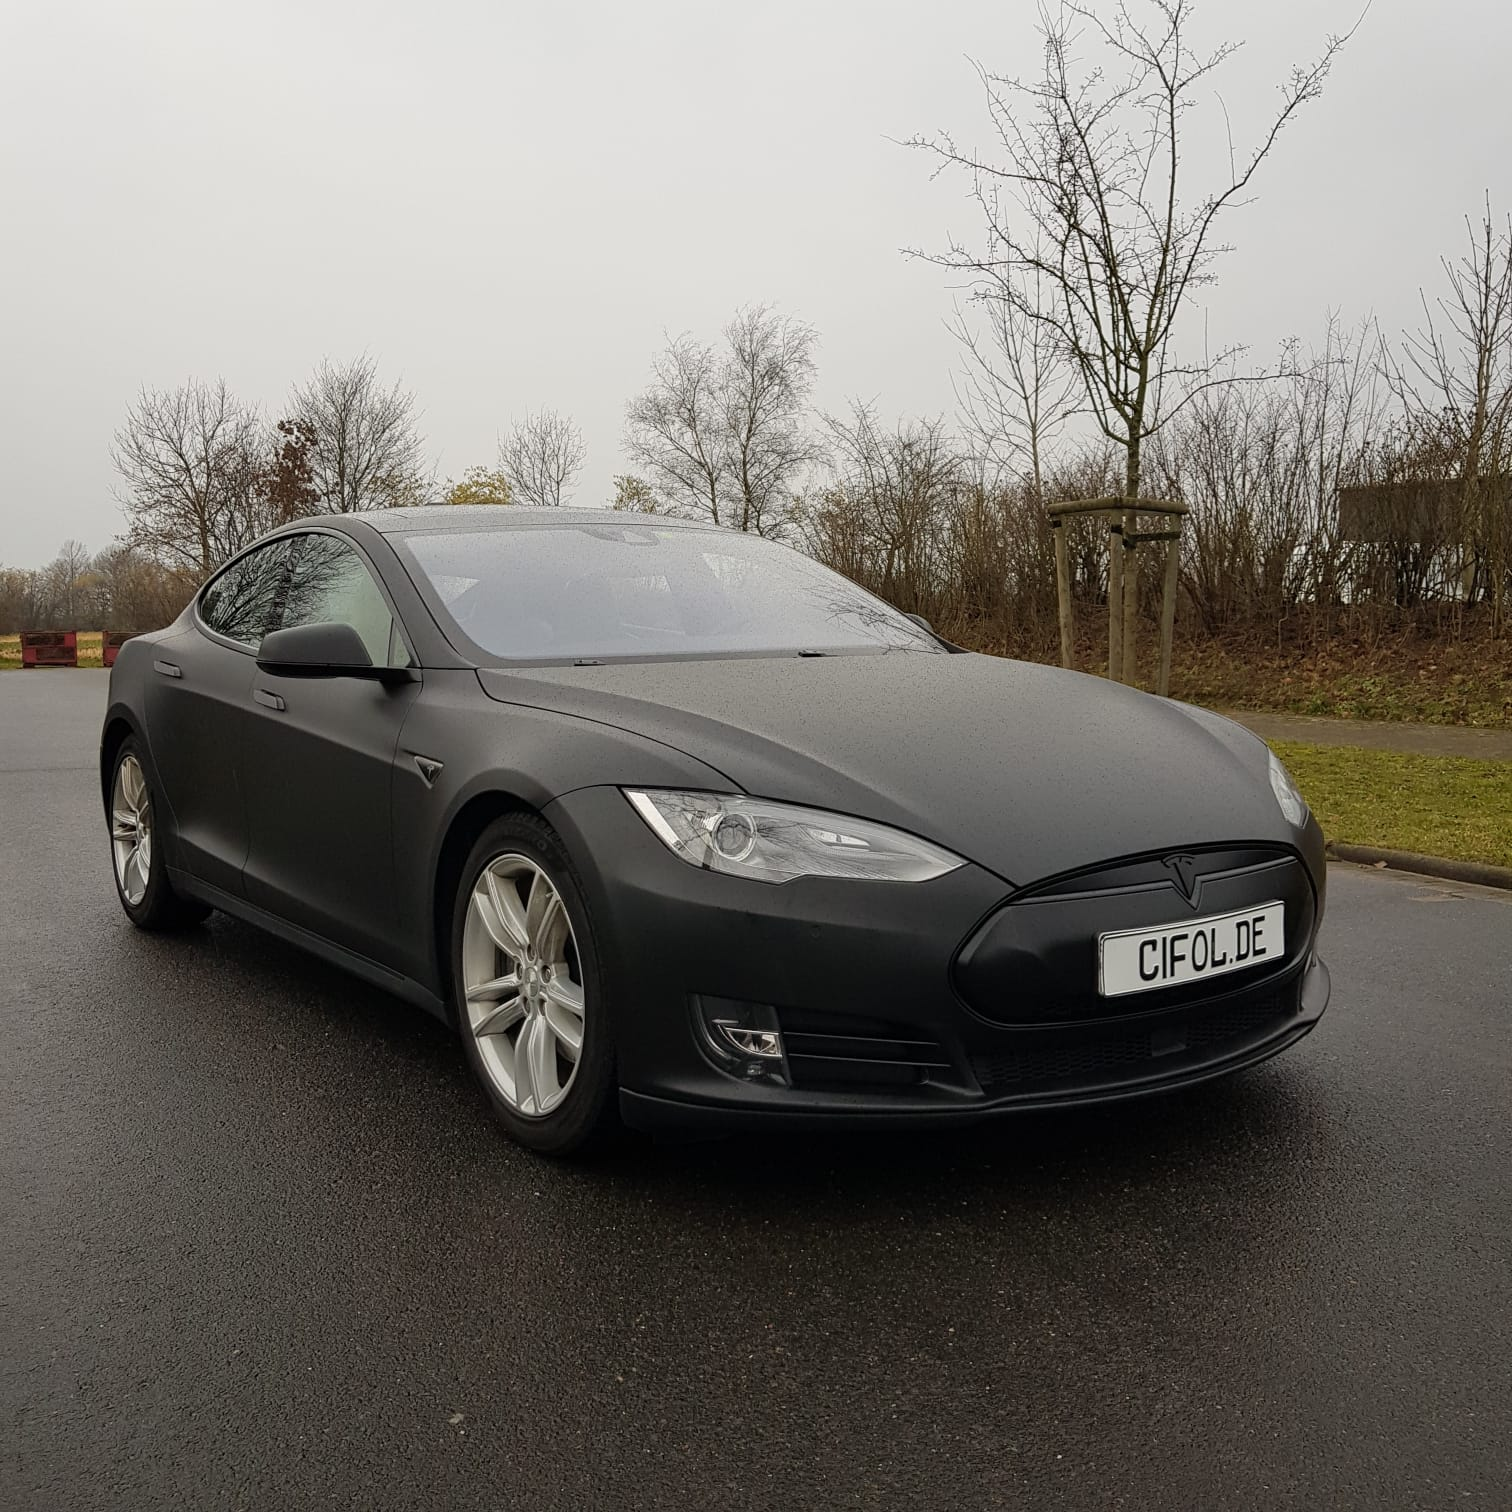 Premiumfolierung Tesla Model S in matt schwarz